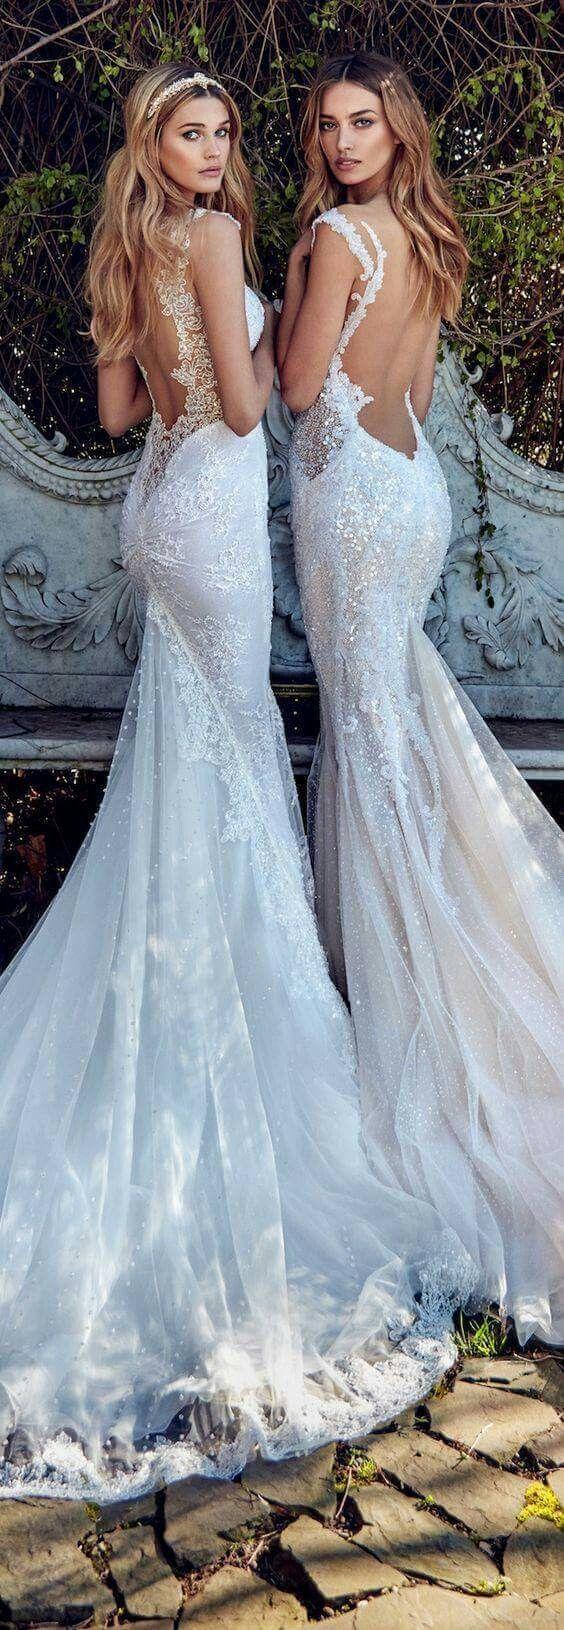 Pin by Vivienne Waibel on weddings<3 | Pinterest | Wedding dress ...